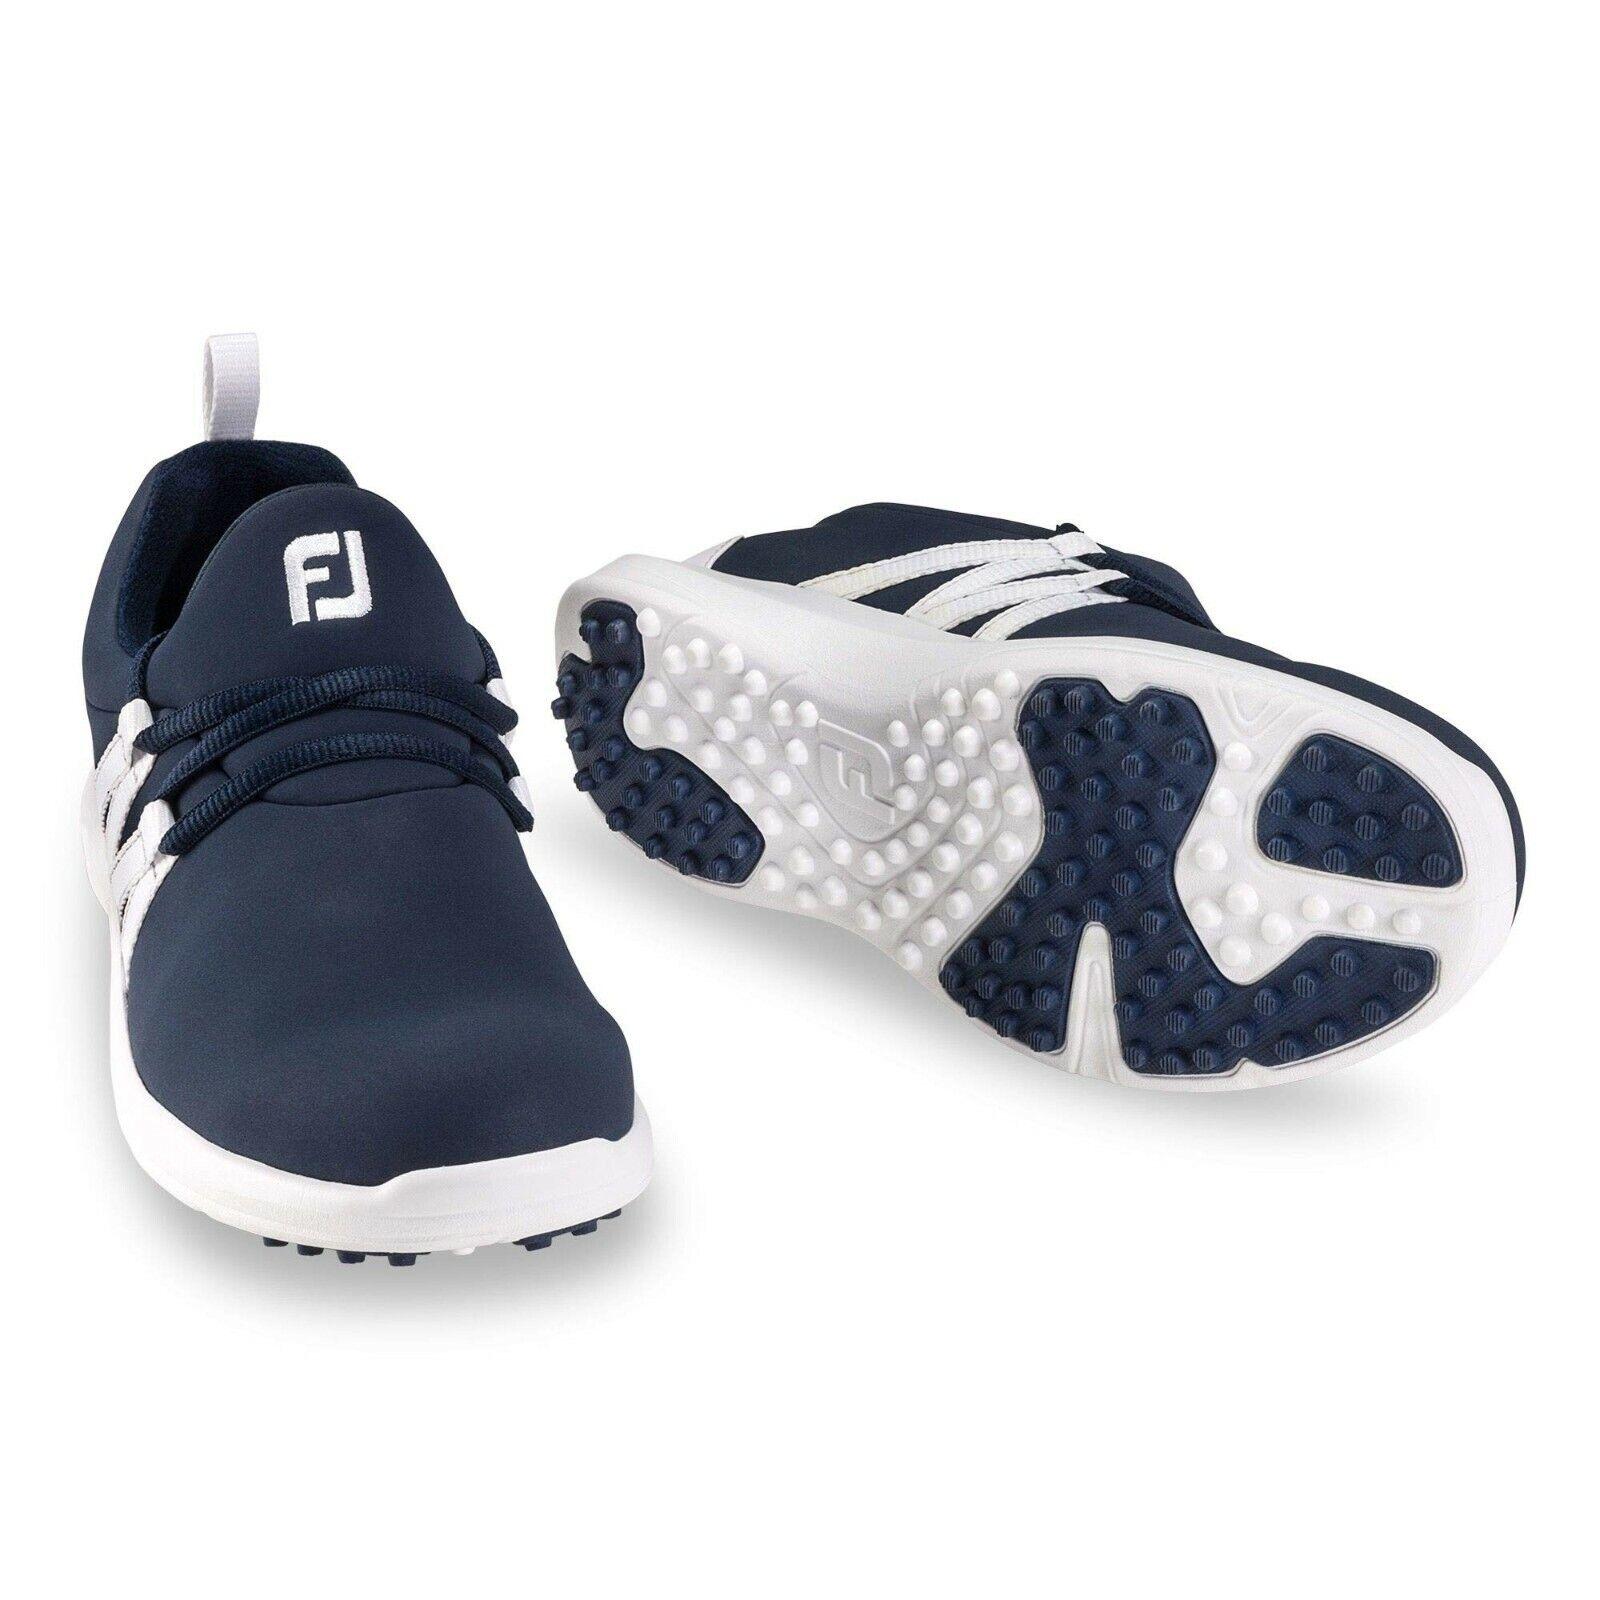 Brand New FootJoy Women's Fj Leisure Slip-on Golf Shoes - Choose Size 3